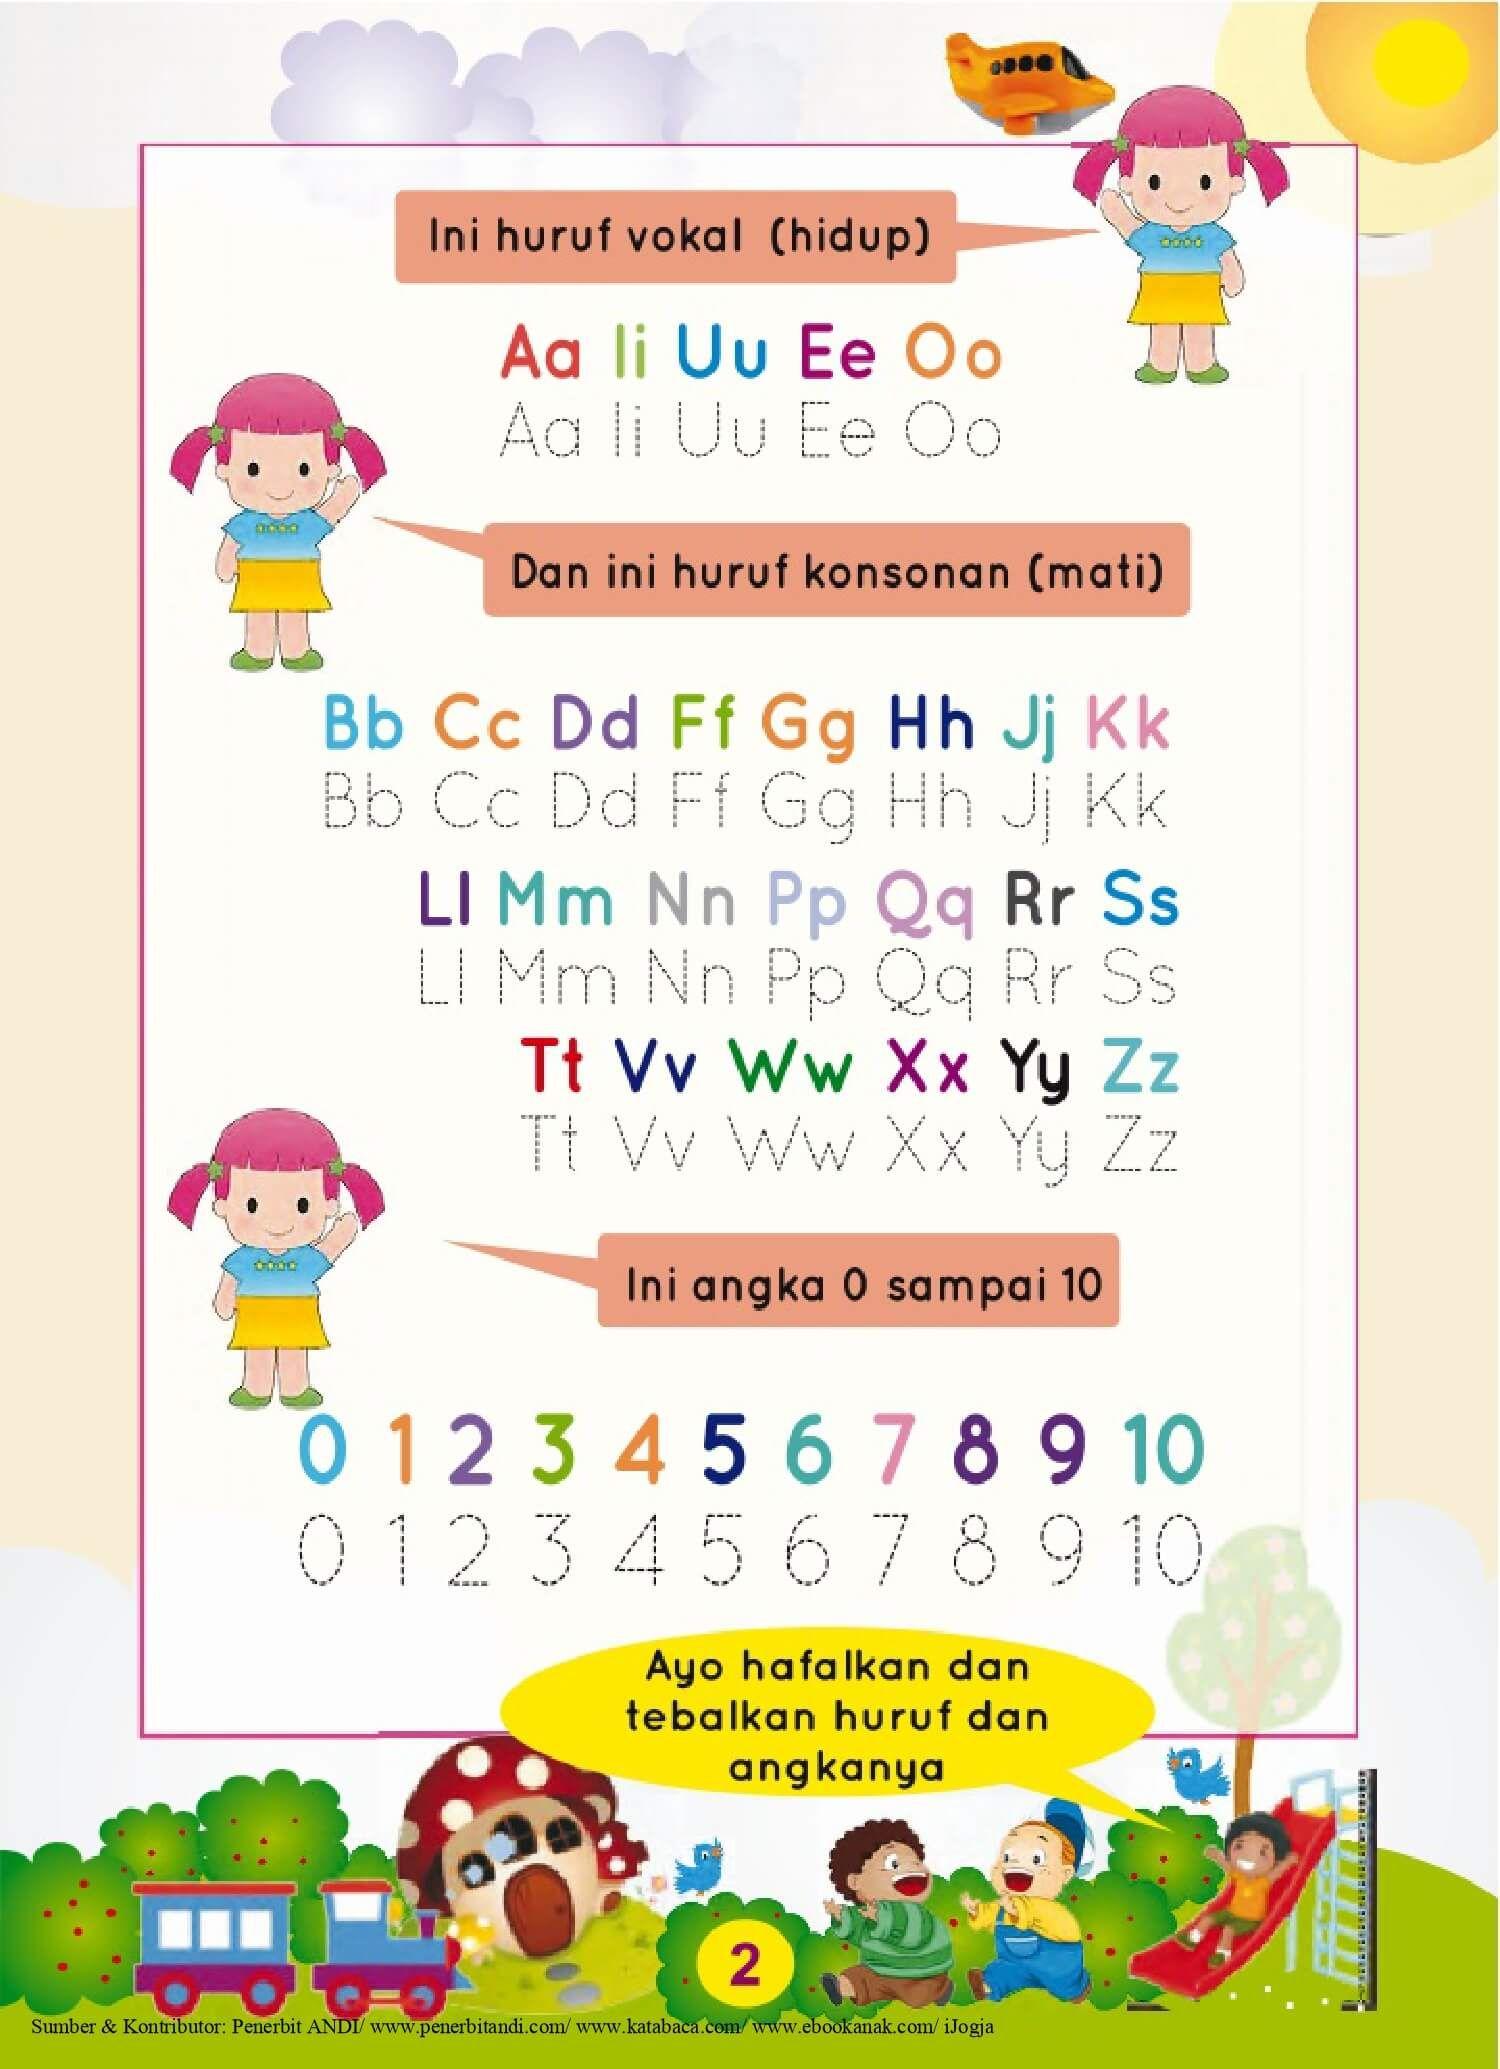 Ebook Super Calistung Mulai Usia Tk Huruf Konsonan Huruf Vokal Dan Angka 11 Ebook Anak Huruf Anak